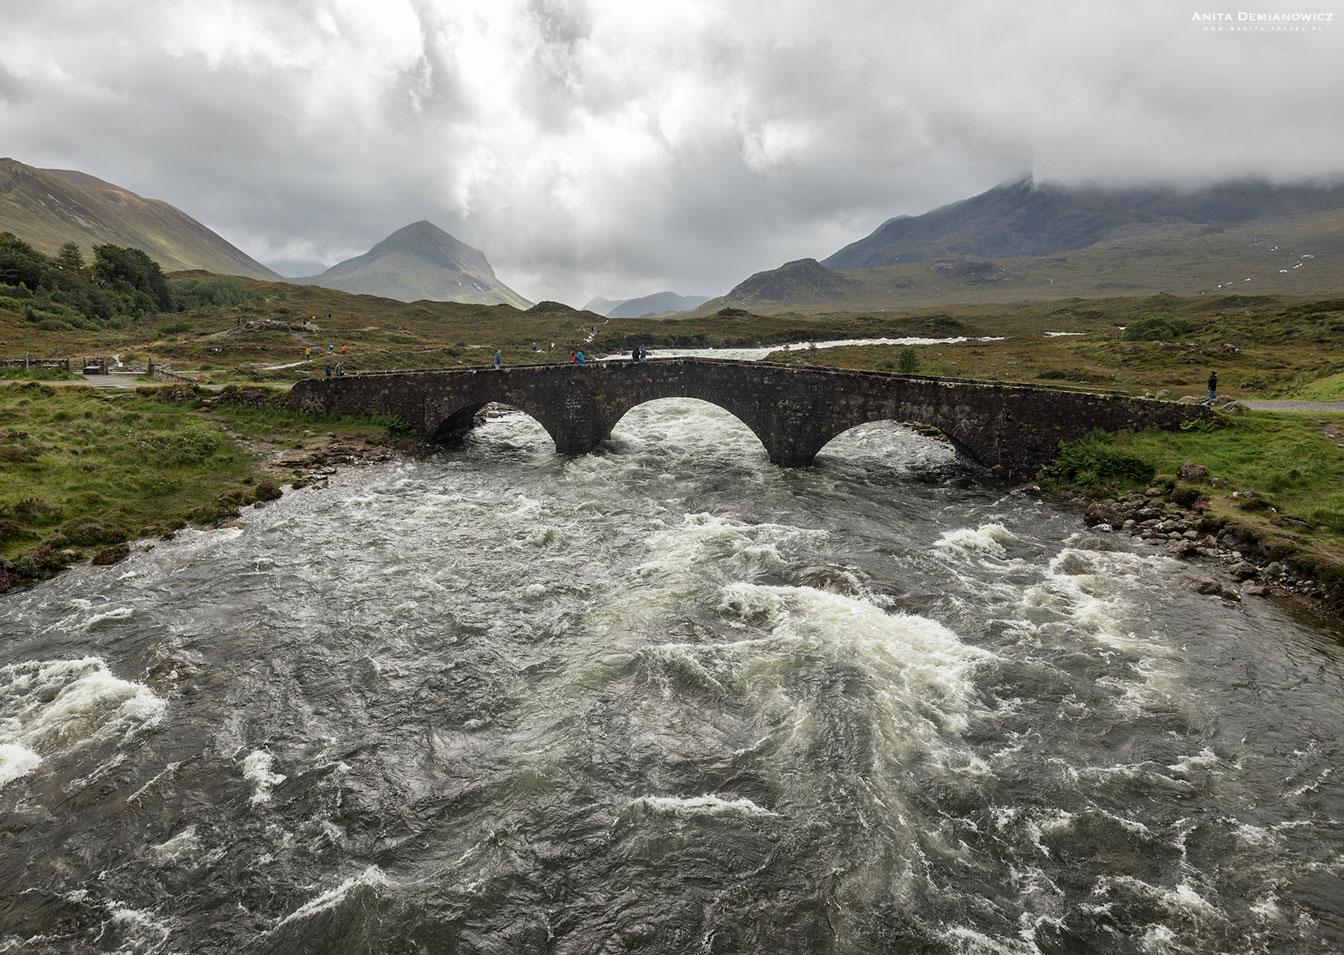 Slingachan, Isle of Skye, Szkocja, Anita Demianowicz